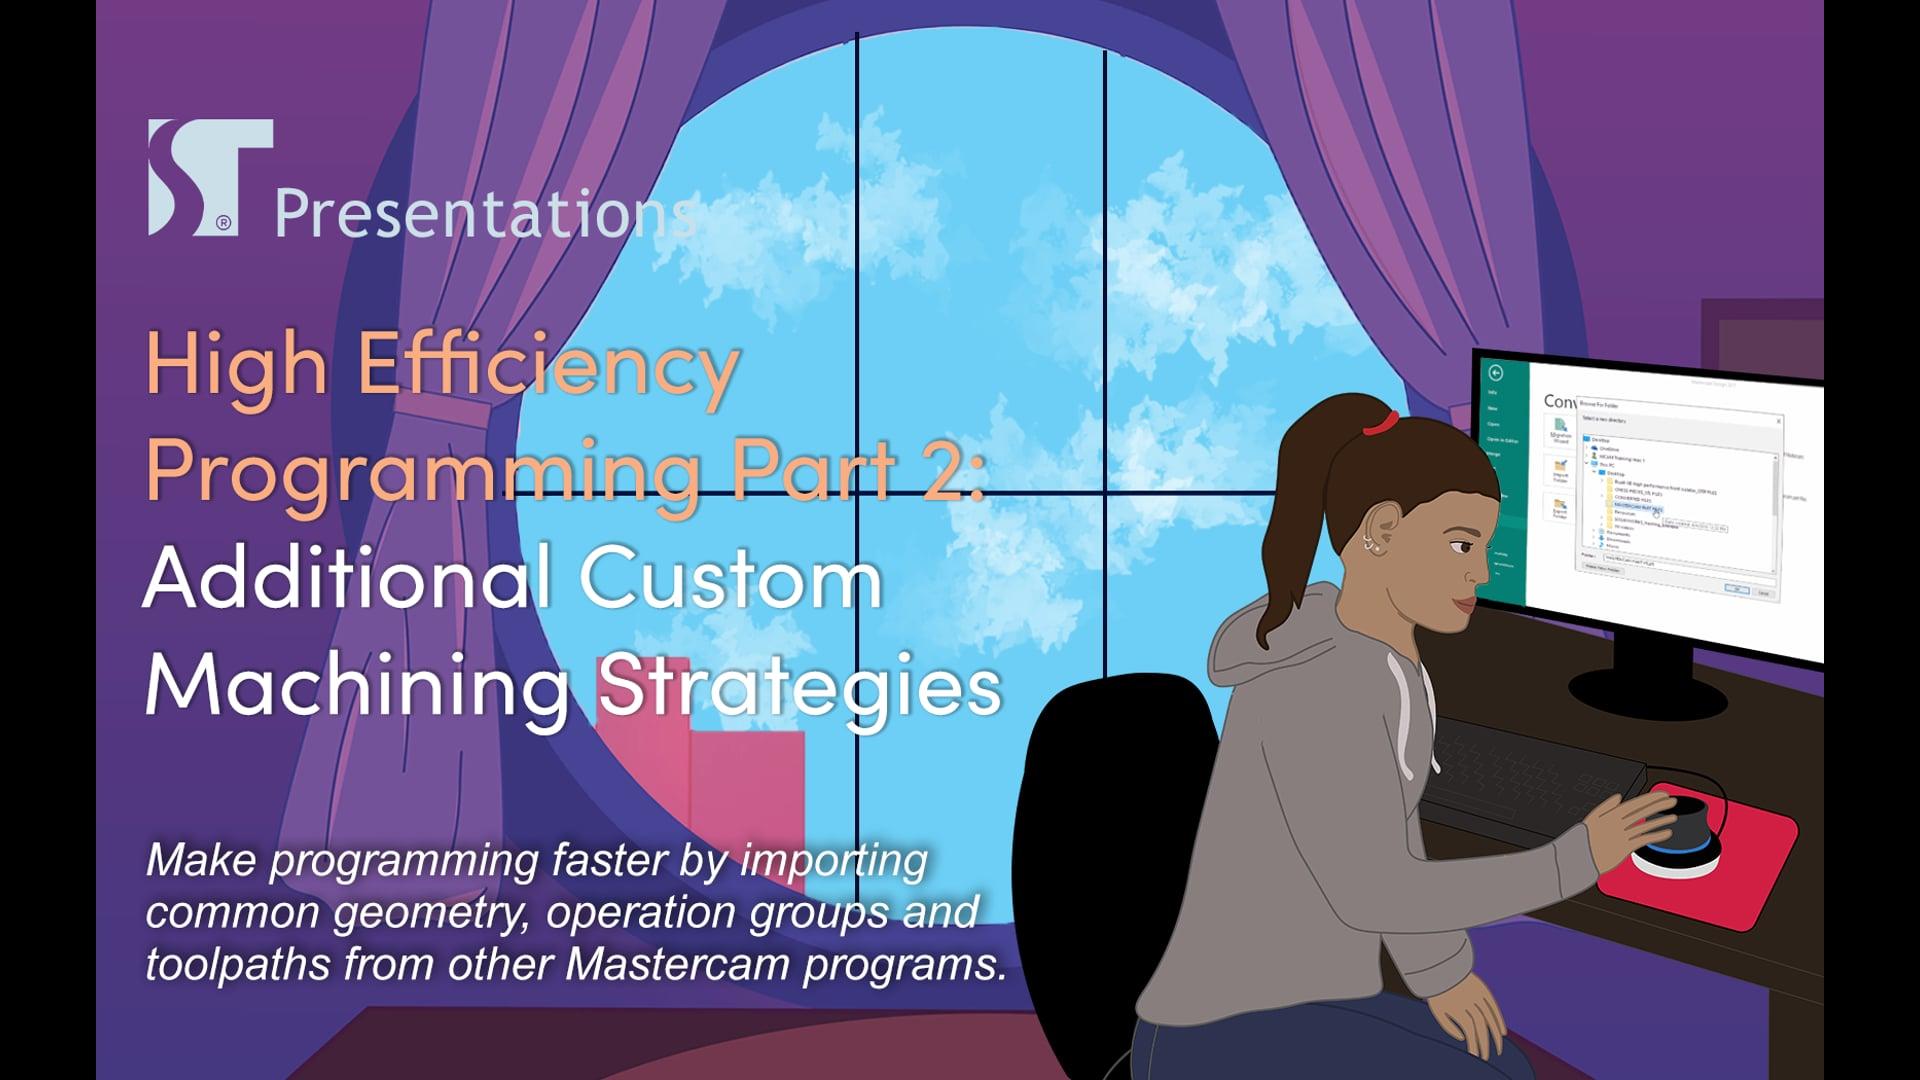 High Efficiency Programming Part 2 - Additional Custom Machining Strategies